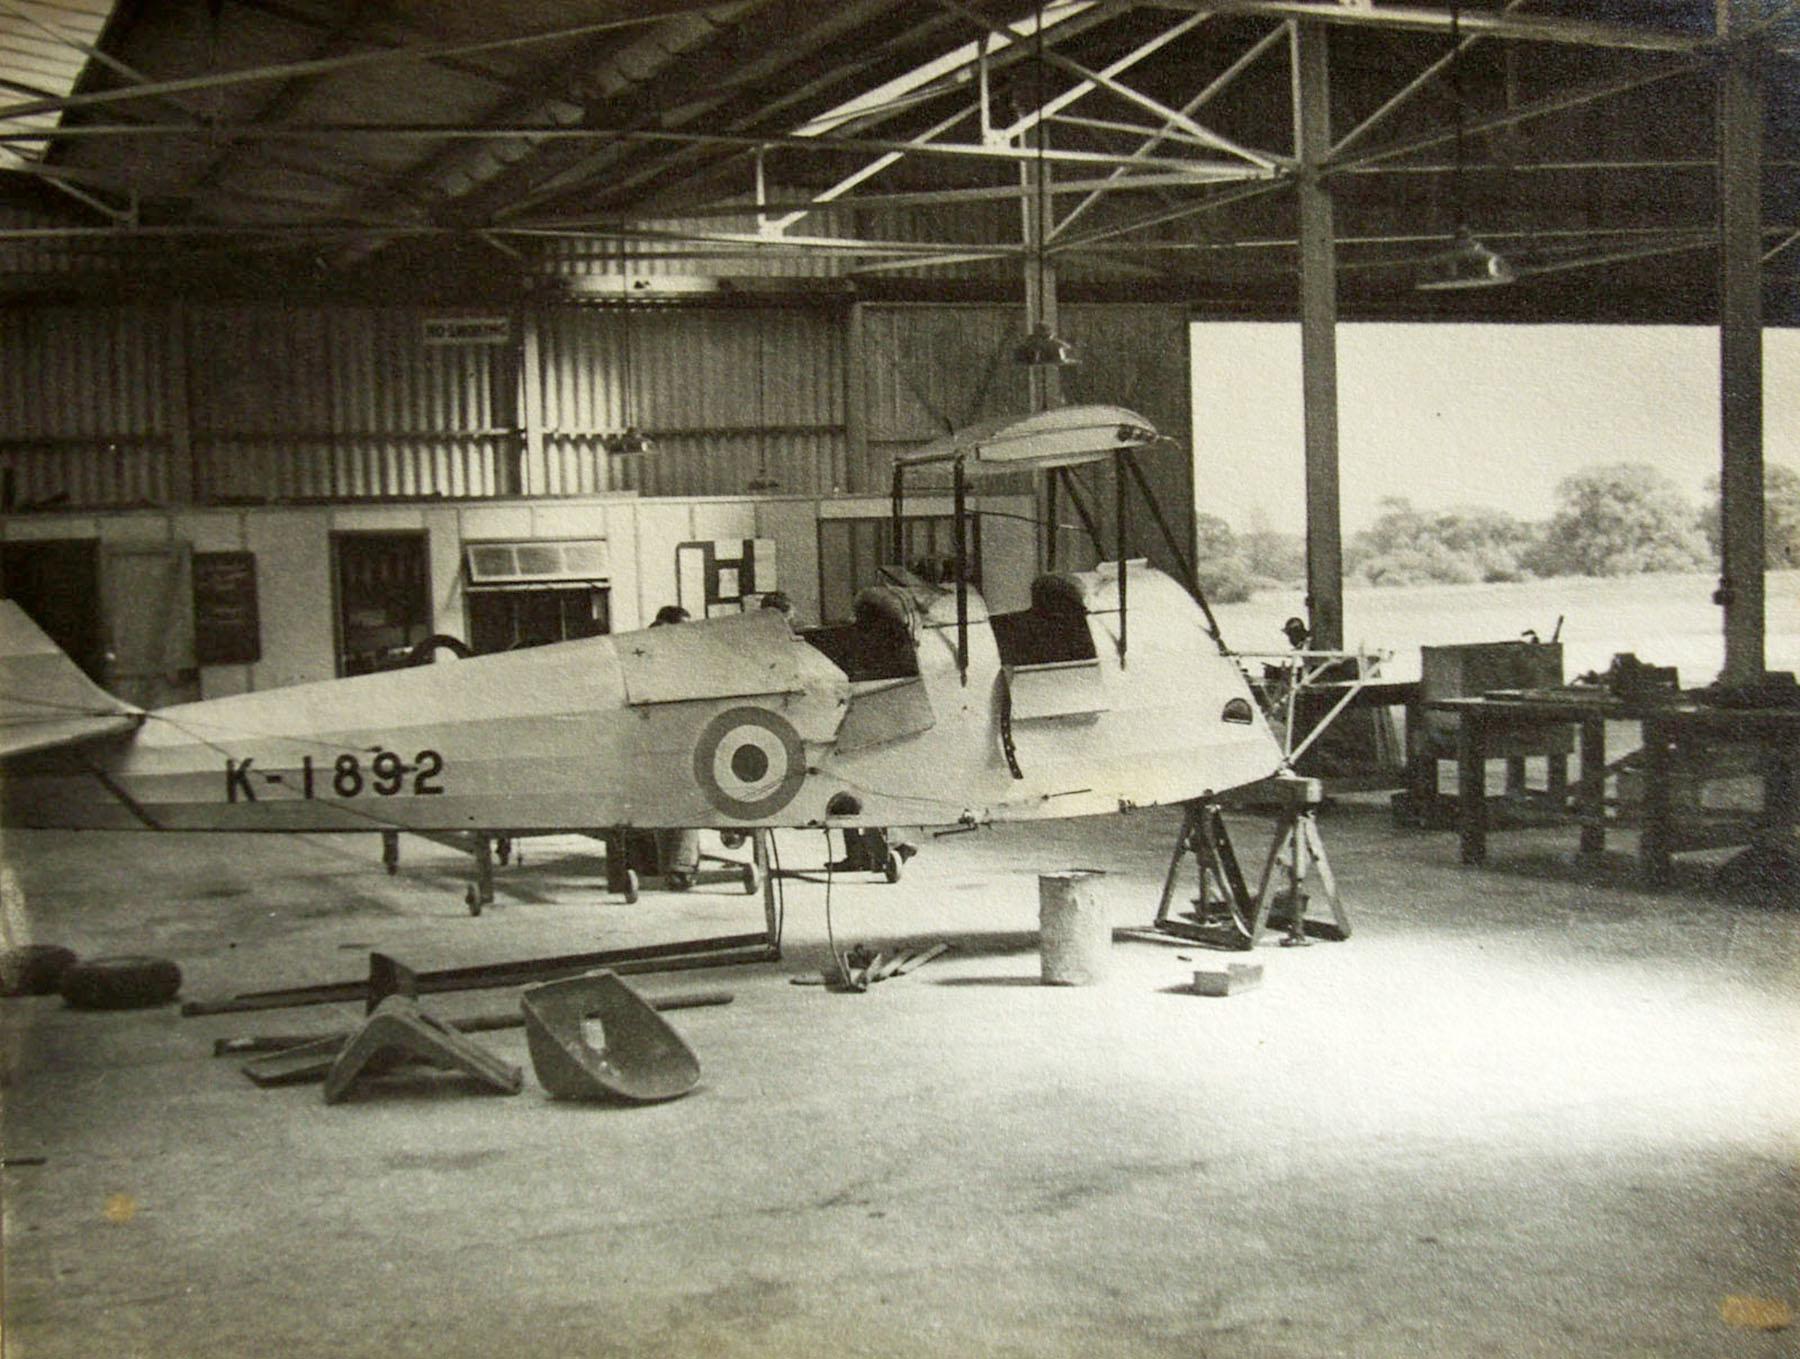 DH60M Gipsy Moth RAF K1892 undergoing maintenance photo taken by Patrick Hayes KIA July 7 1940 01